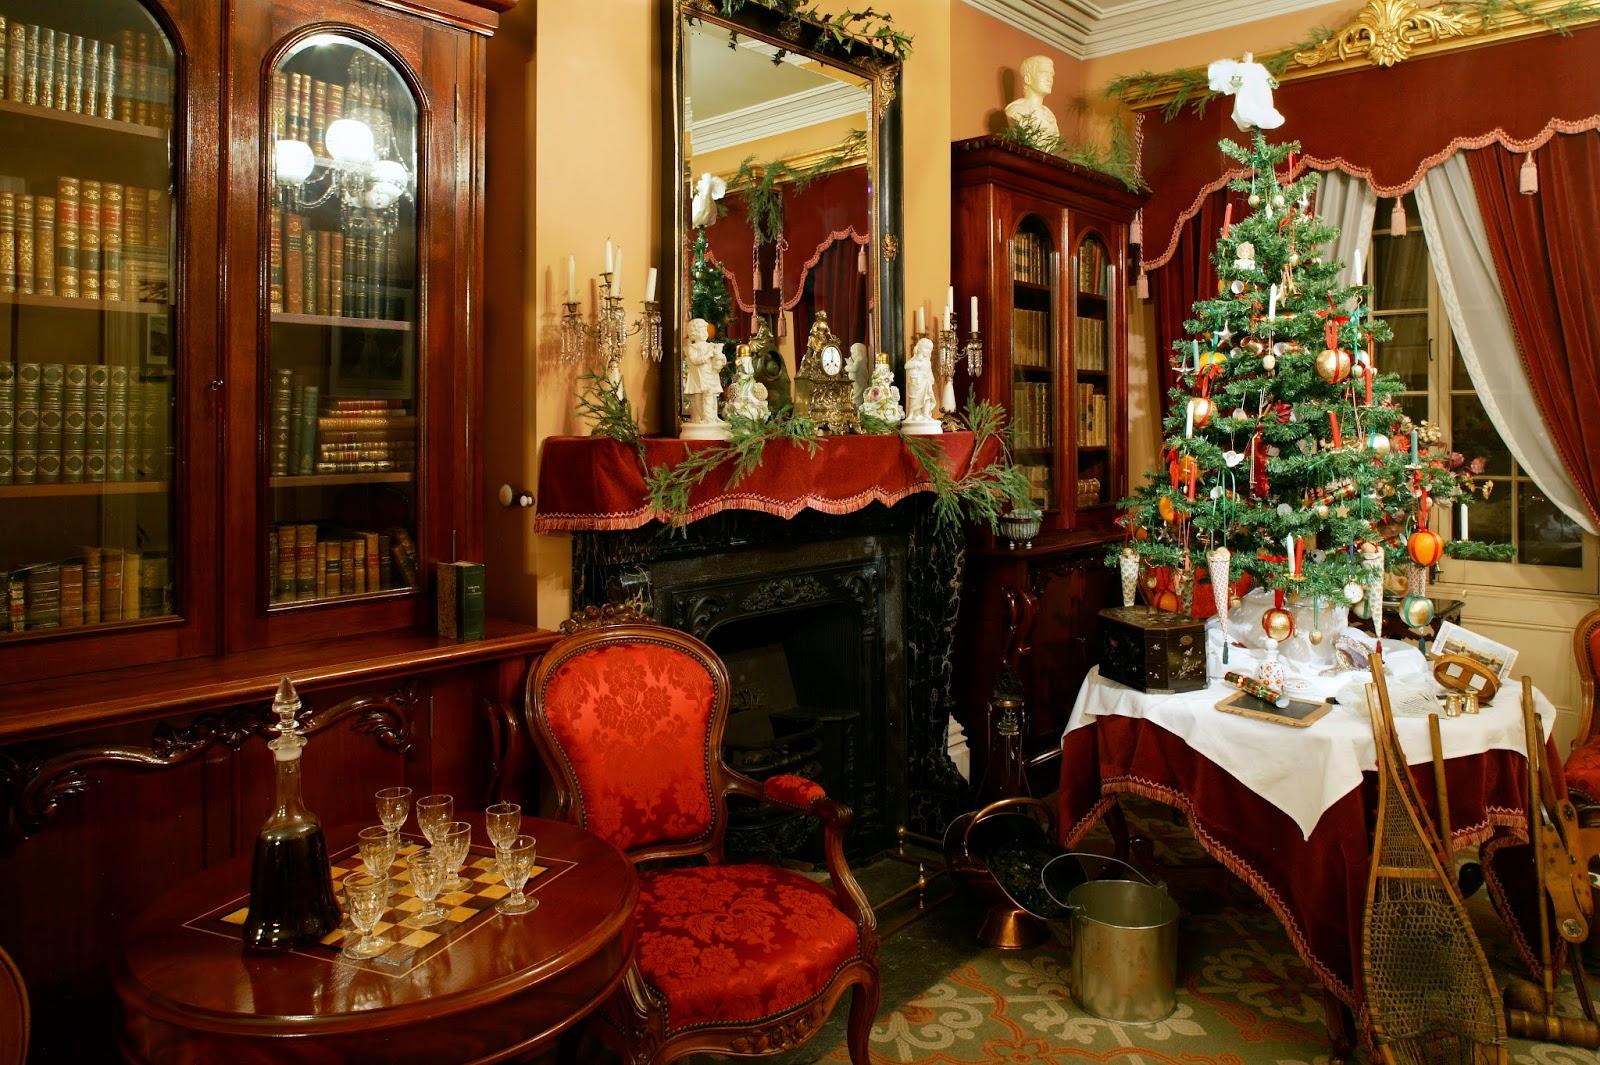 Case Di Campagna Addobbate Per Natale : Albero di natale ikea e wwf